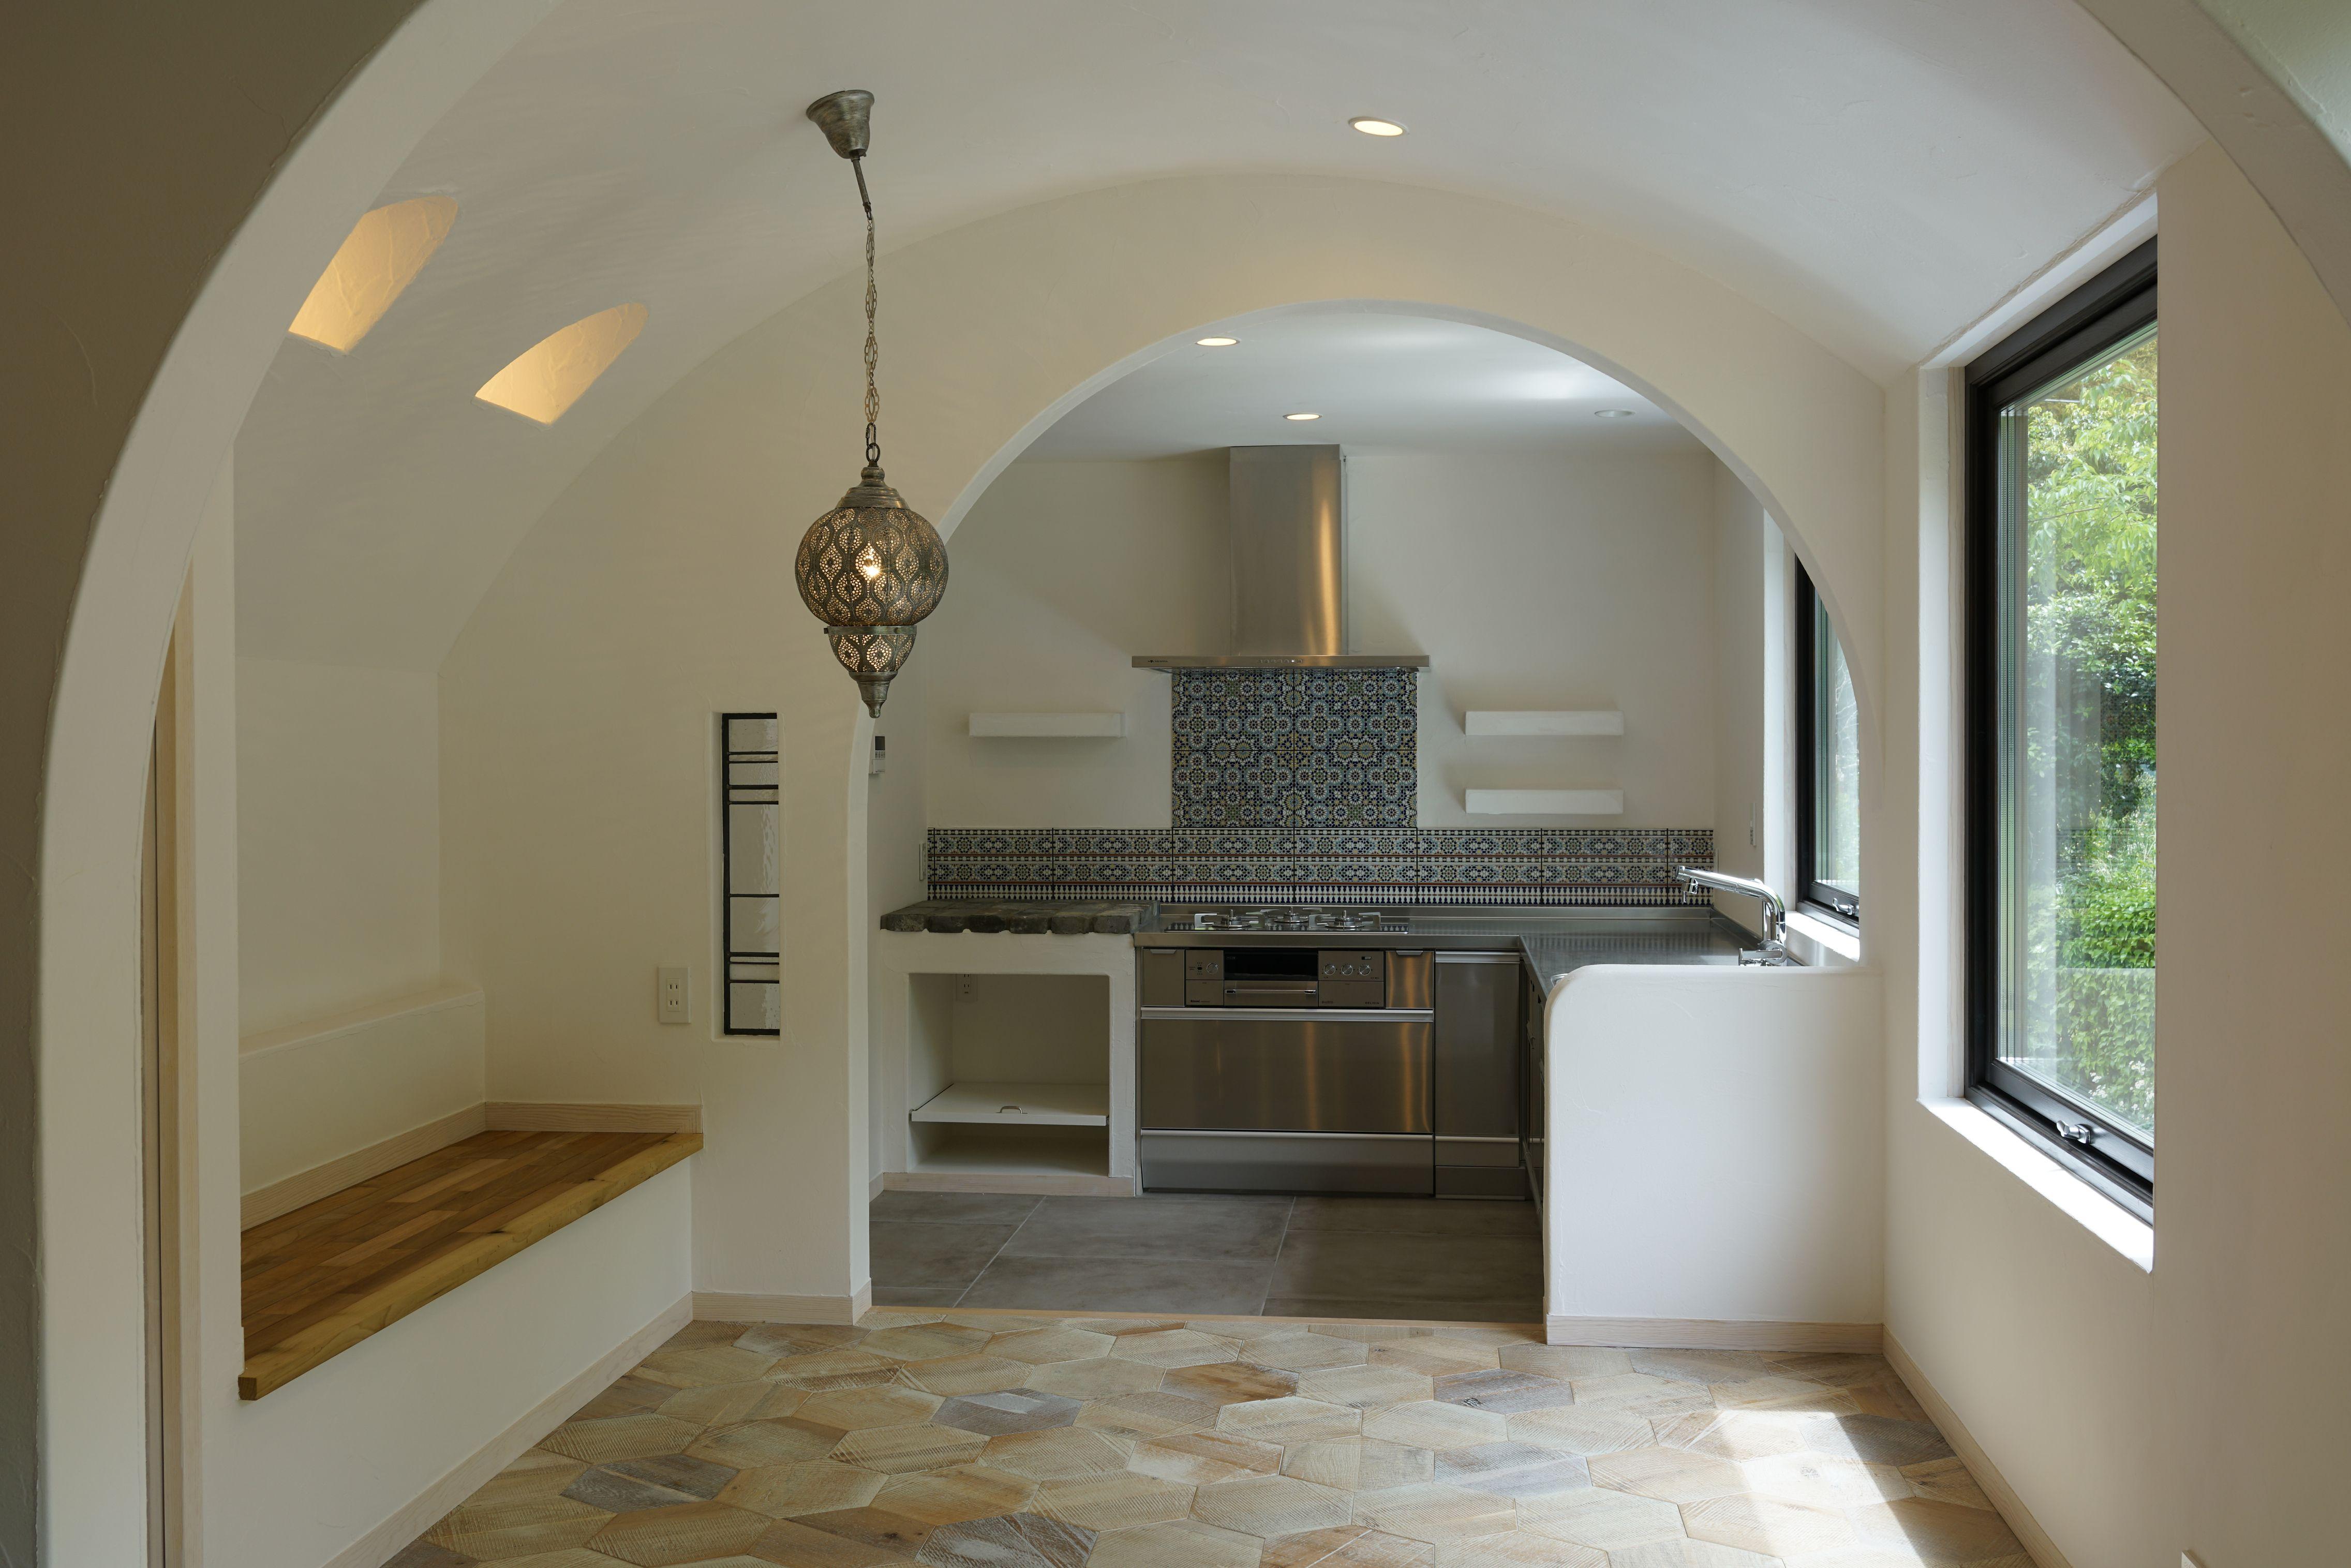 home design dining kitchen tepee heart hexagon morocco ドーム